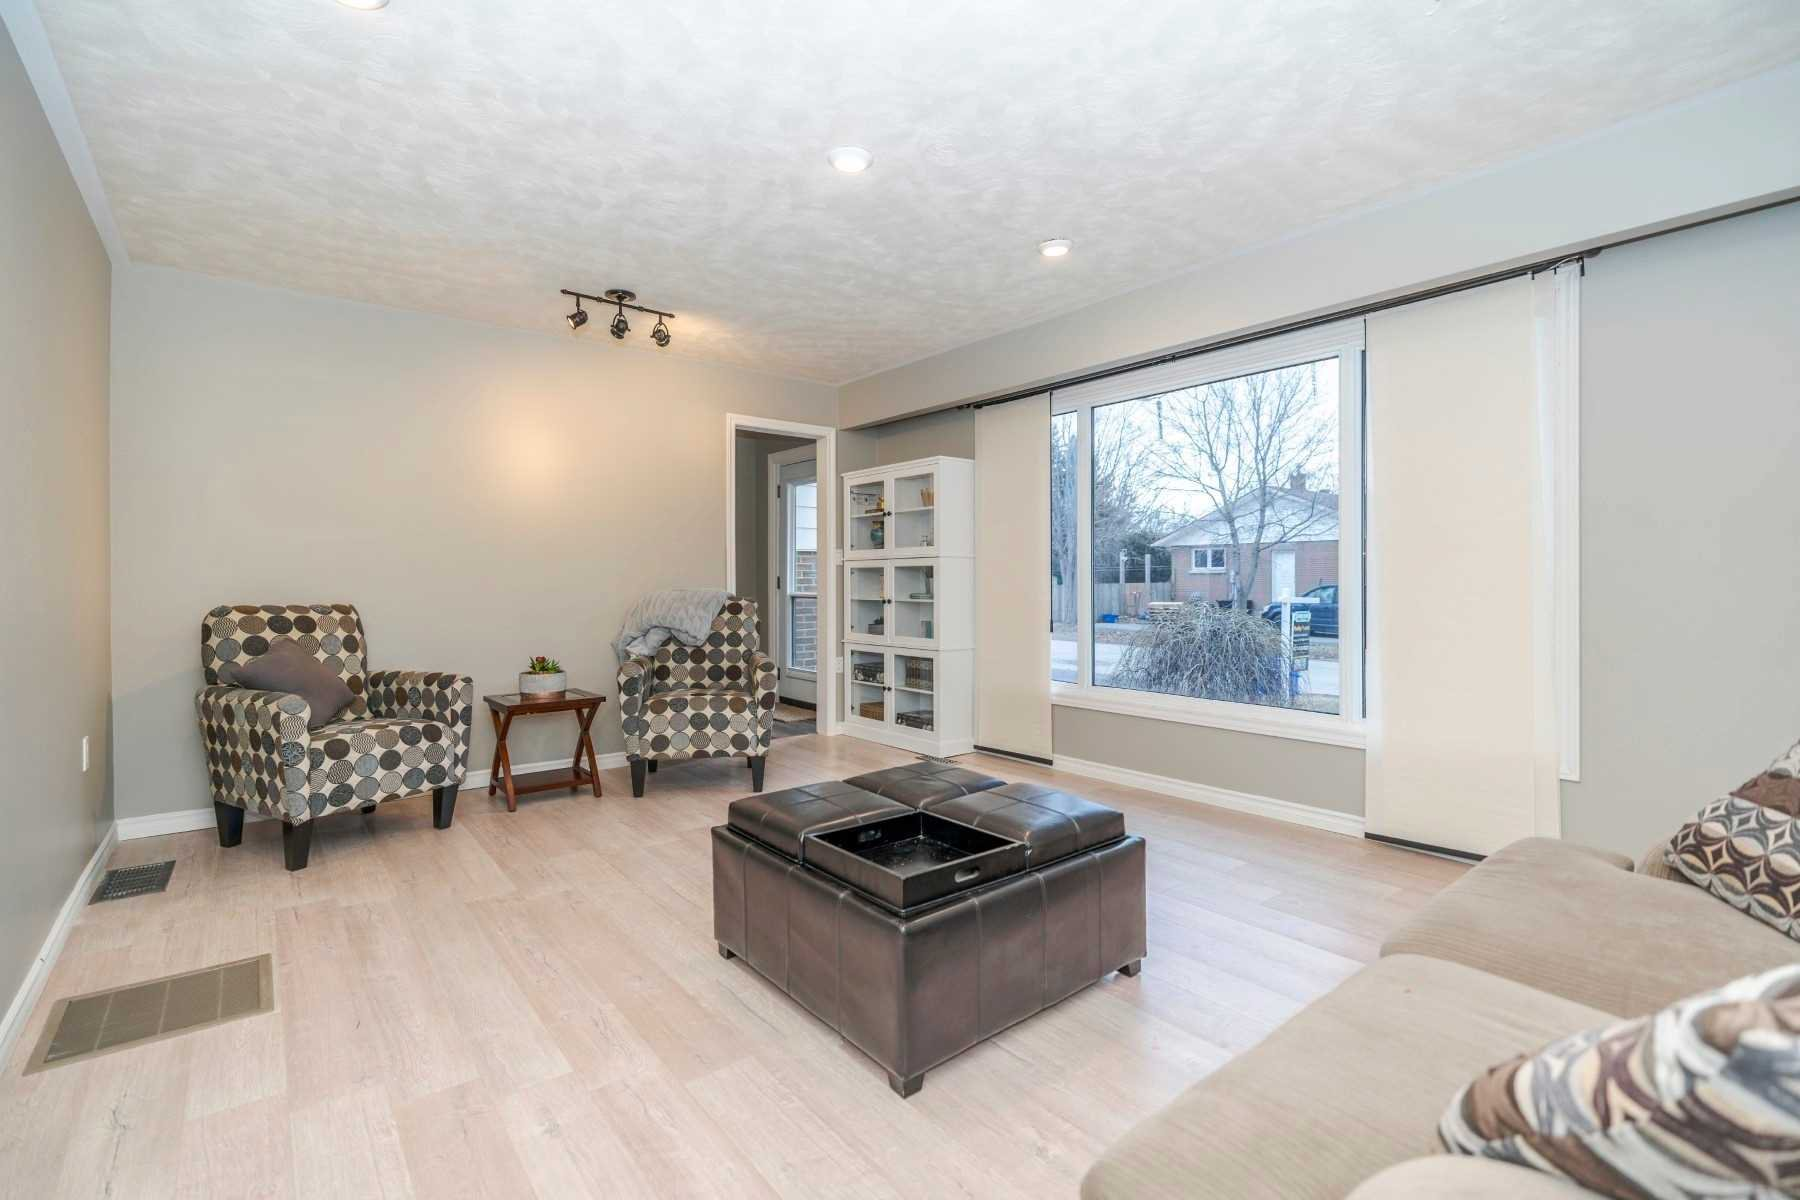 Photo 3: Photos: 190 N Church Street in Clarington: Orono House (Sidesplit 4) for sale : MLS®# E4463047